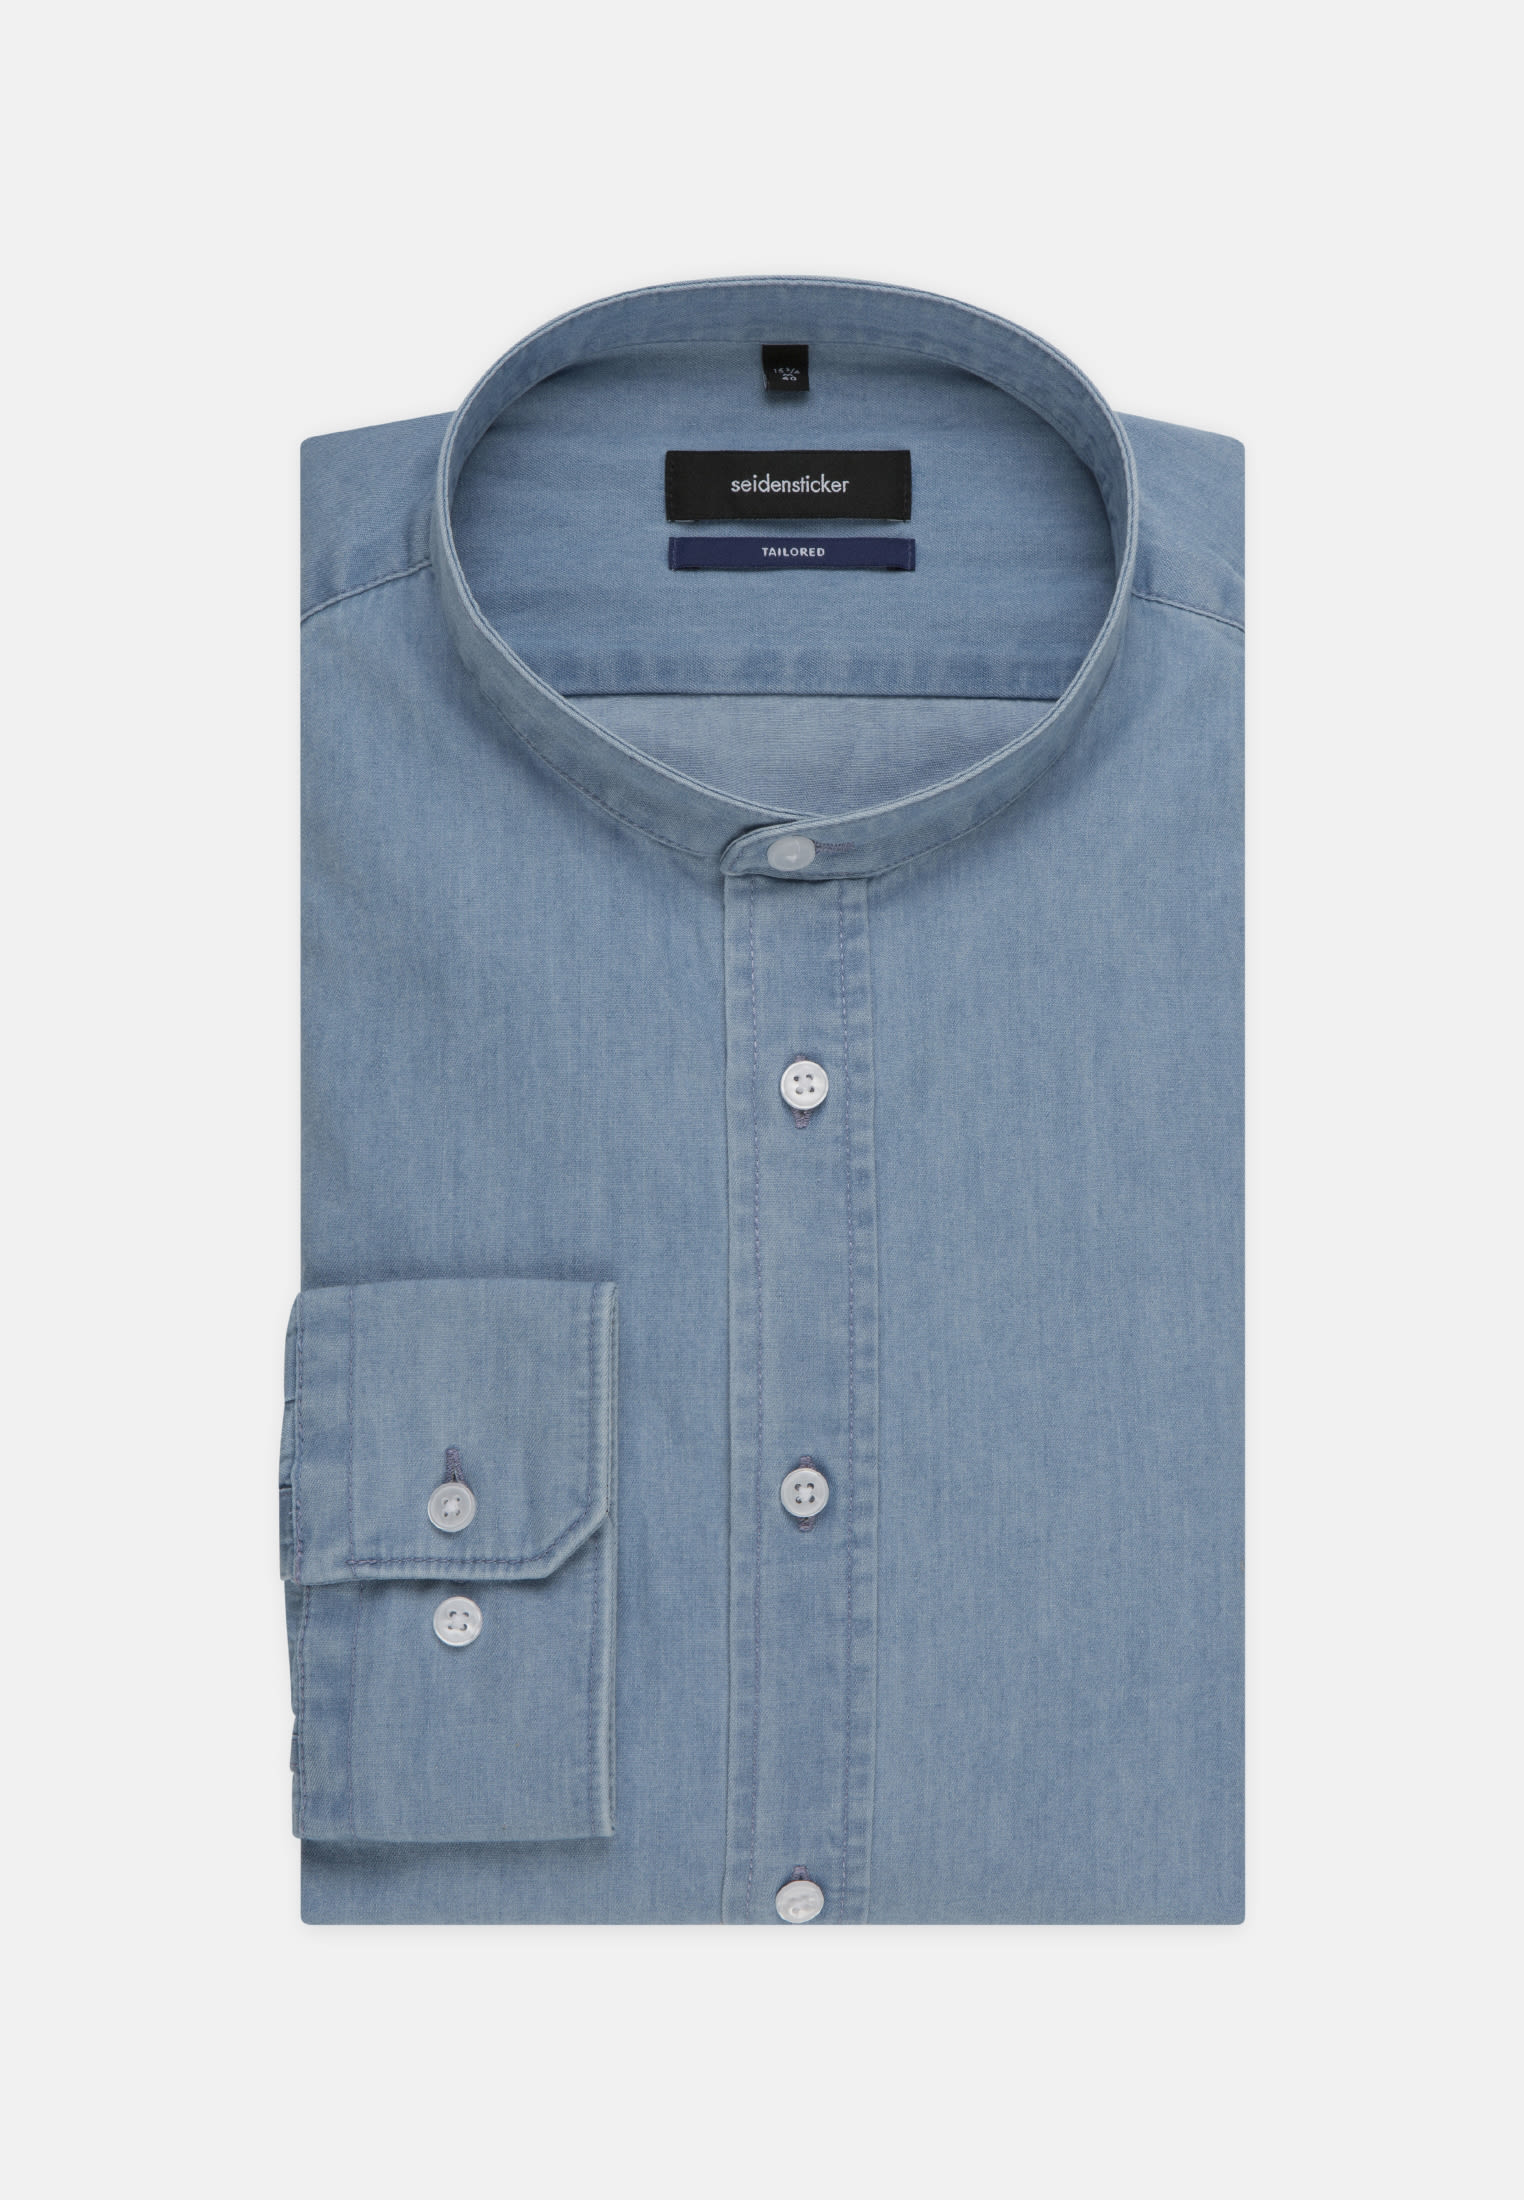 Easy-iron Denim Business Shirt in Tailored with Stand-Up Collar in blau |  Seidensticker Onlineshop